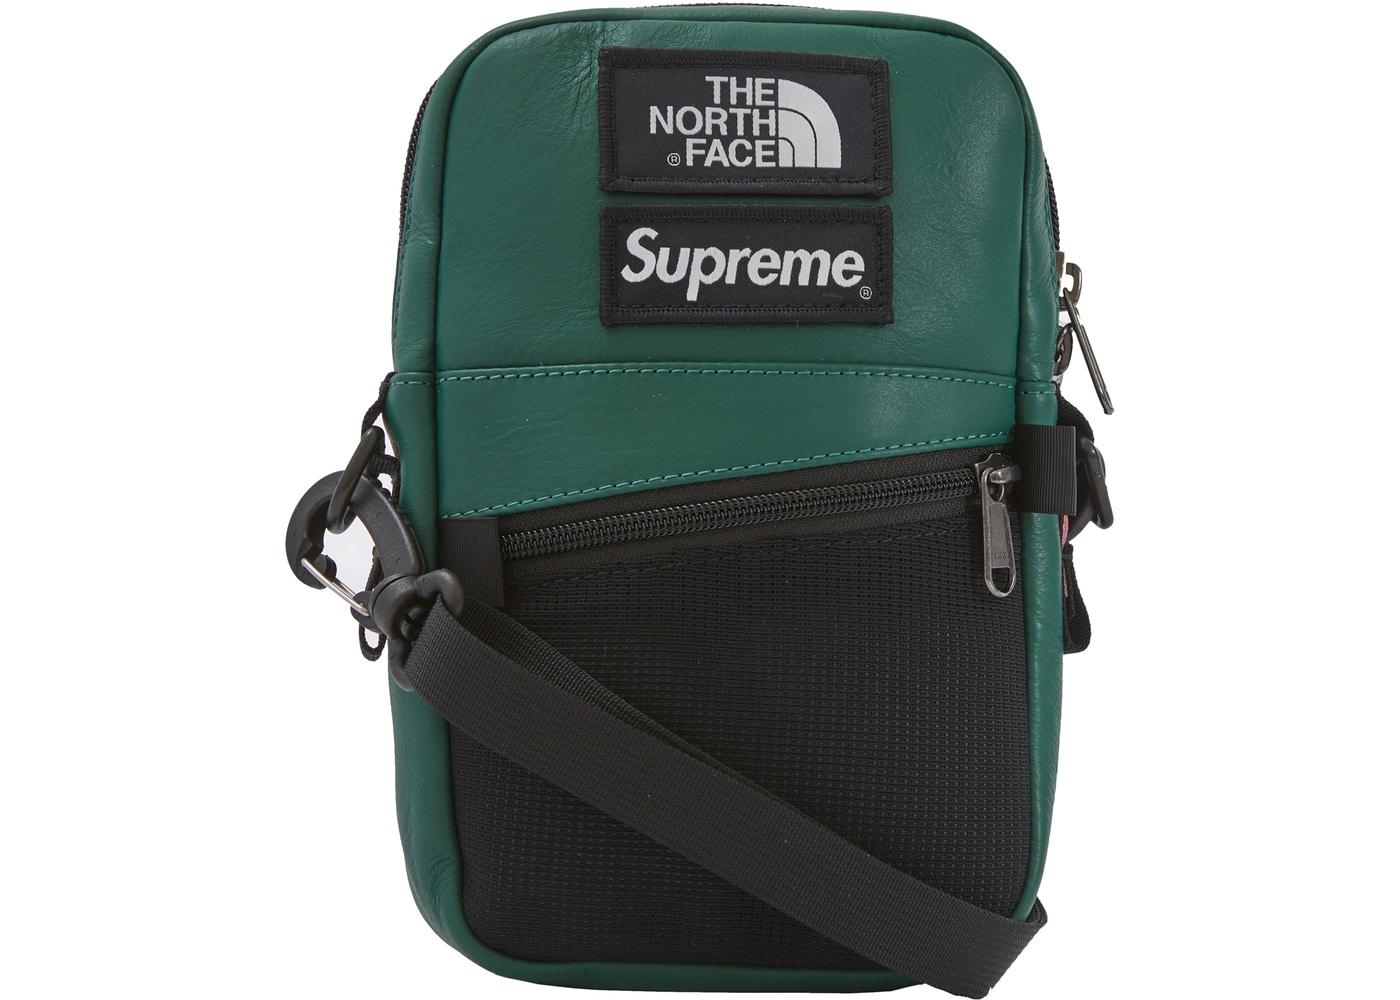 441e89f7b620 Supreme The North Face Leather Shoulder Bag Dark Green - FW18